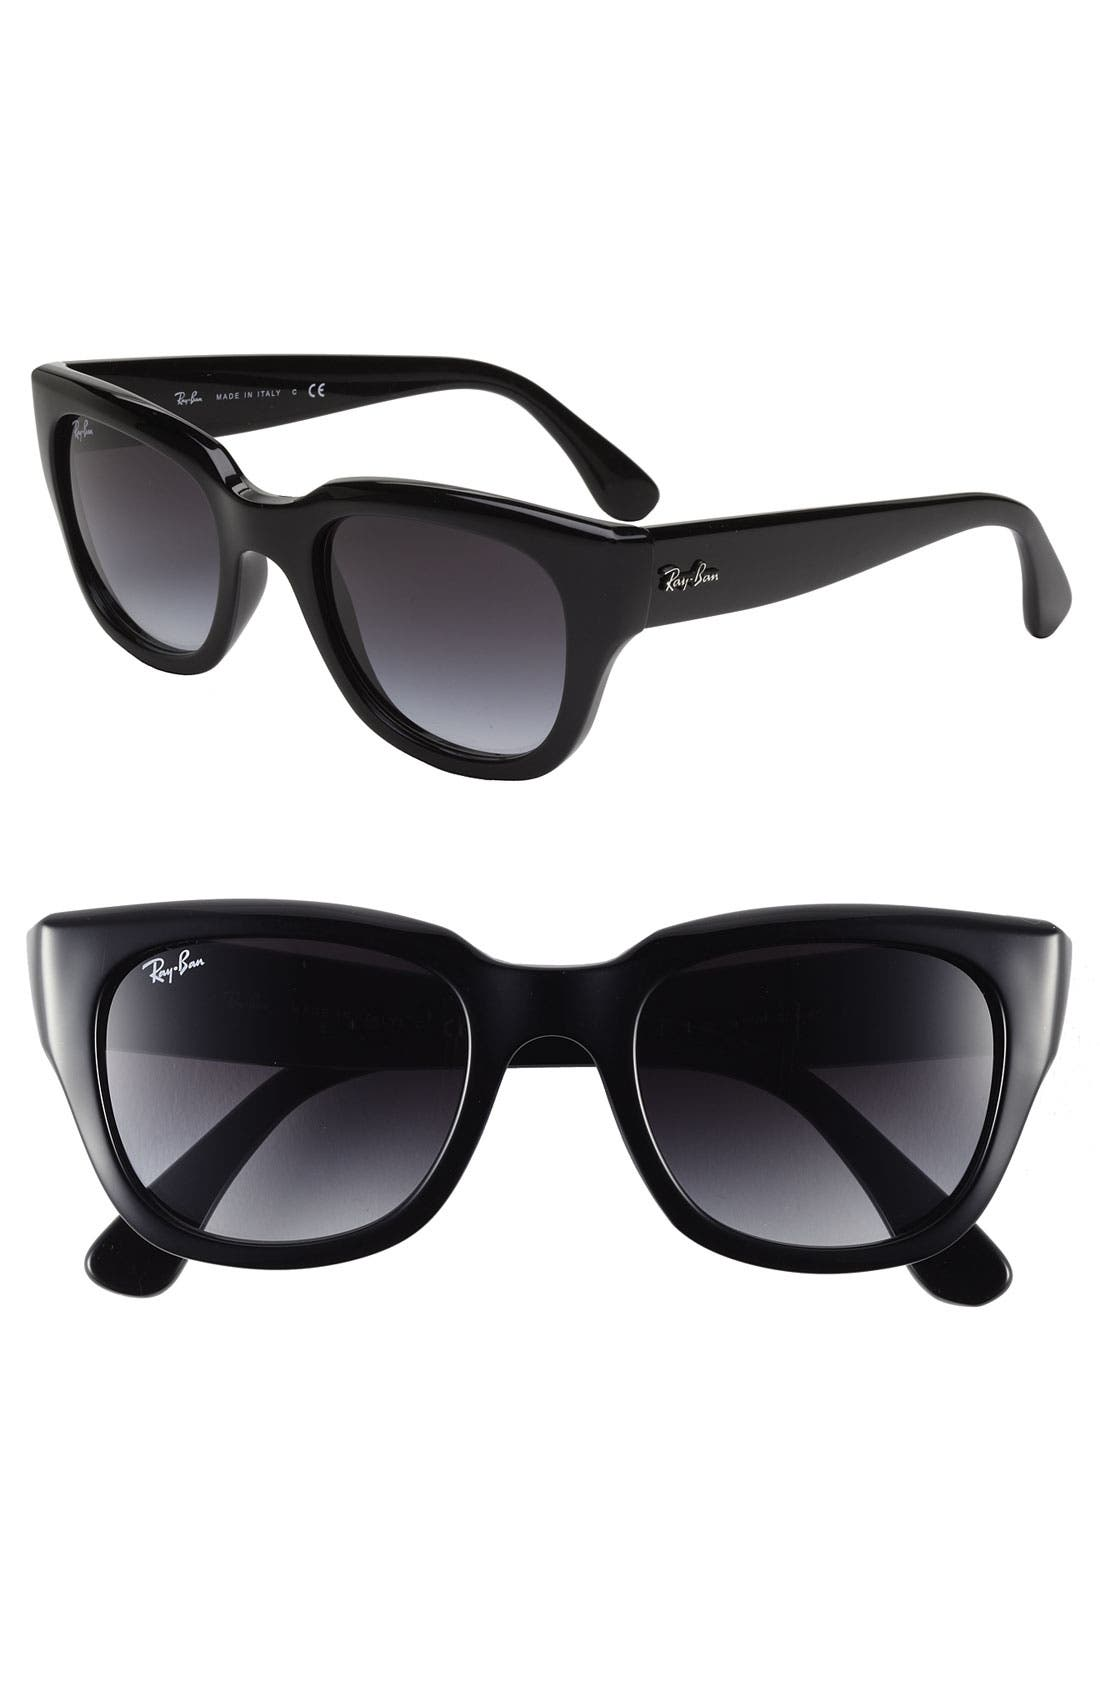 52mm Retro Sunglasses,                             Main thumbnail 1, color,                             Black/ Grey Gradient